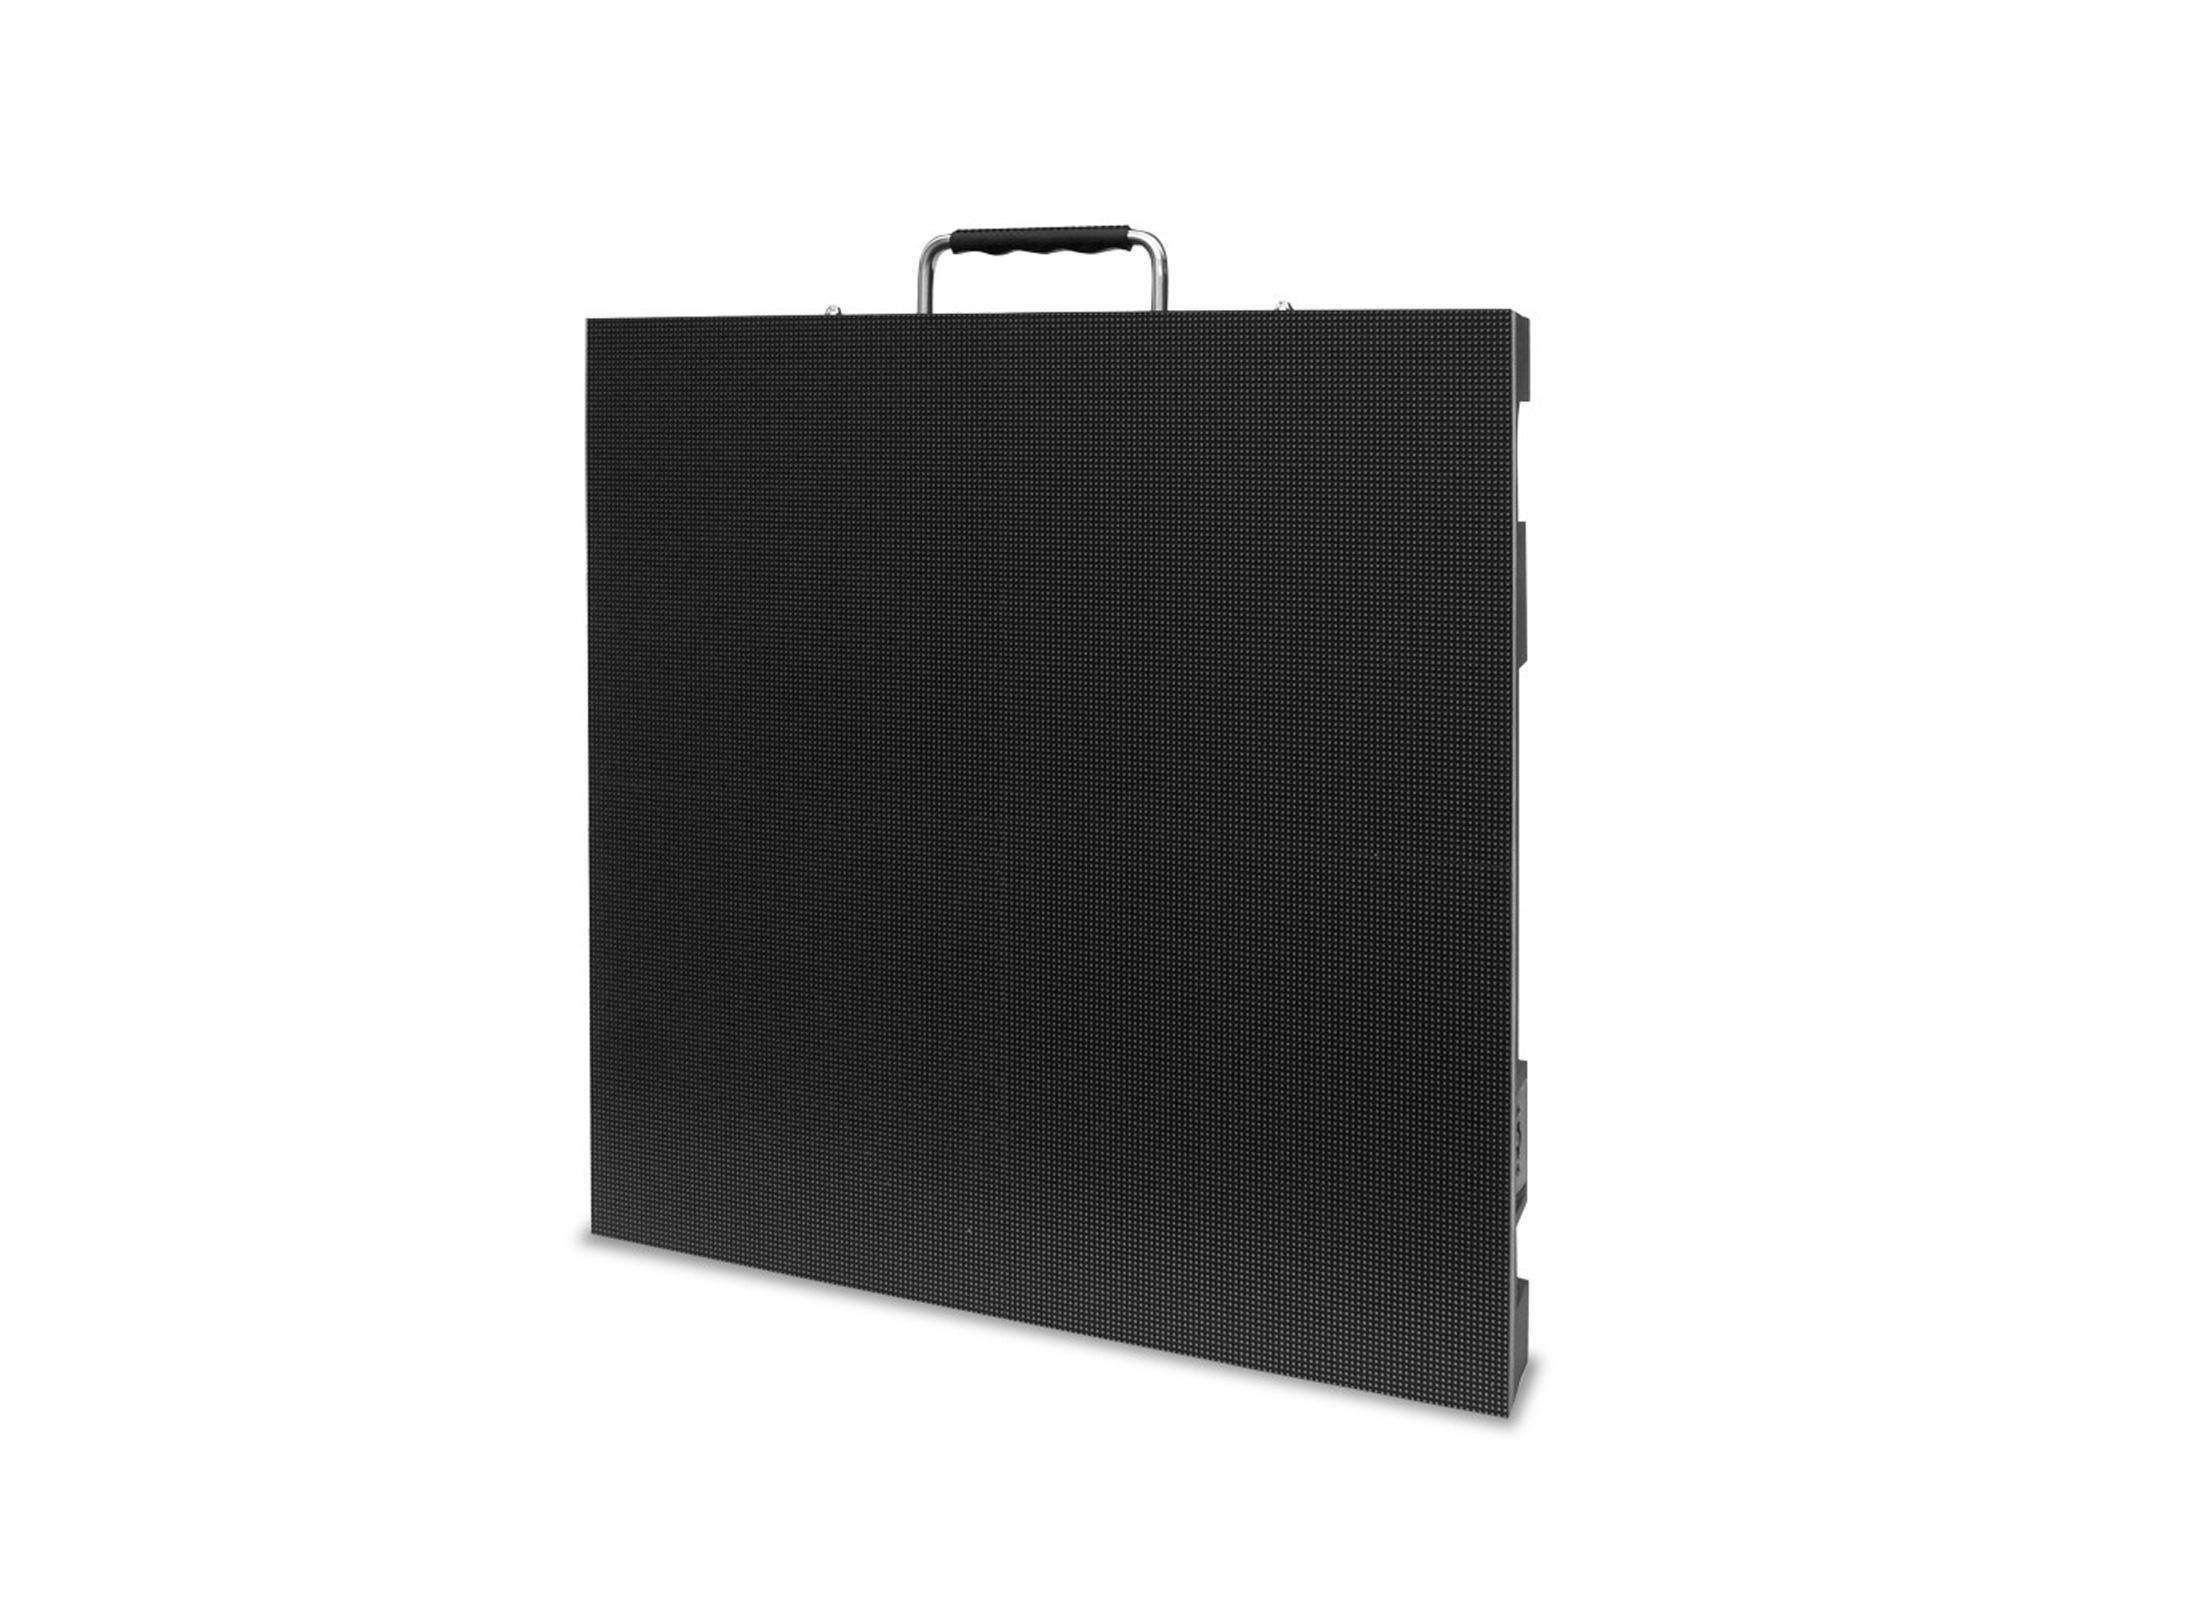 Licht Panel Led : Led panel rund cm w lm warmweiß lichtpanel eek a